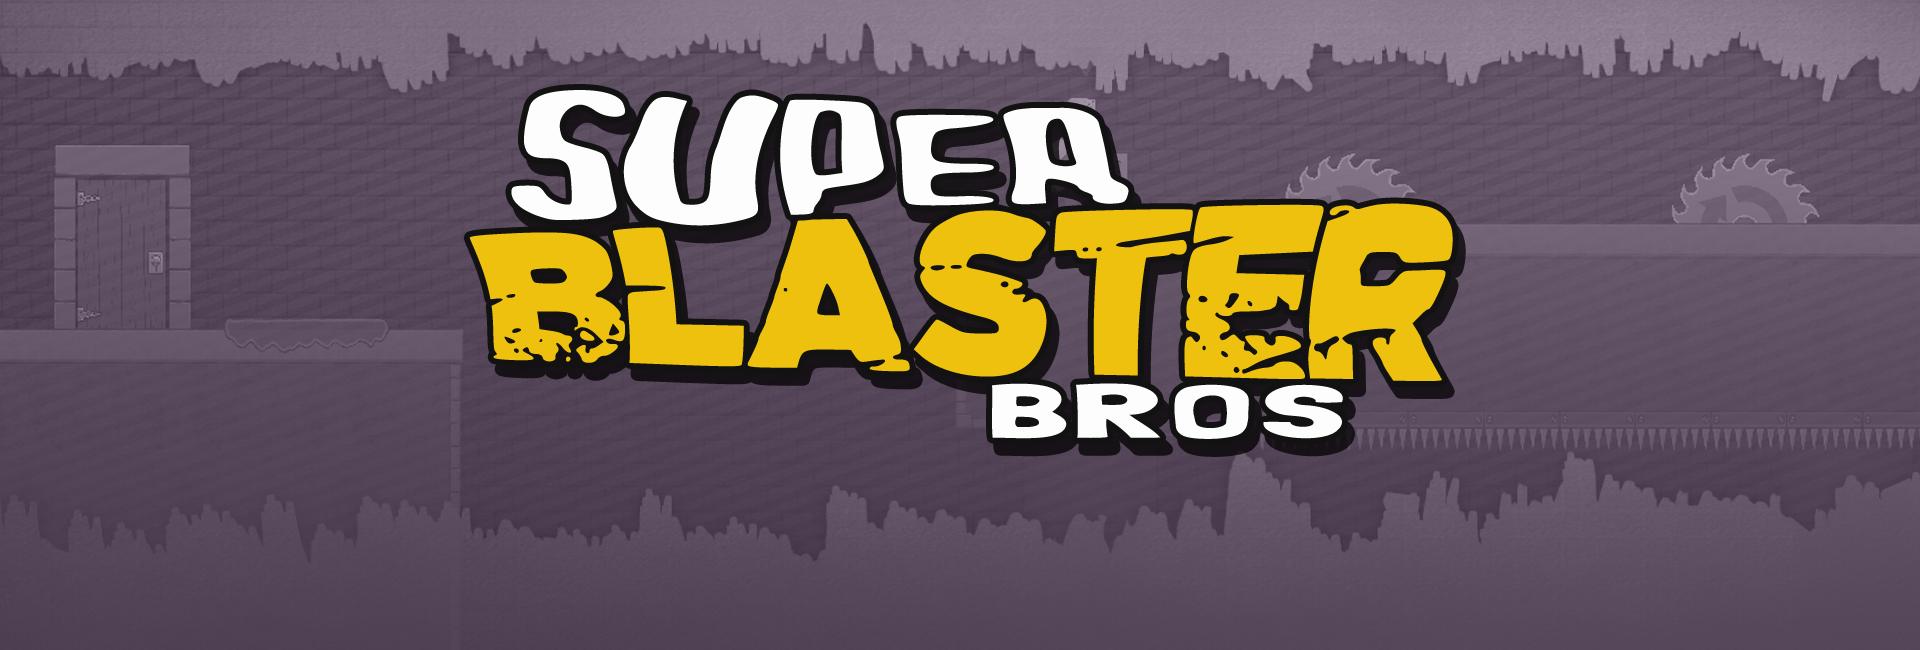 Super Blaster Bros